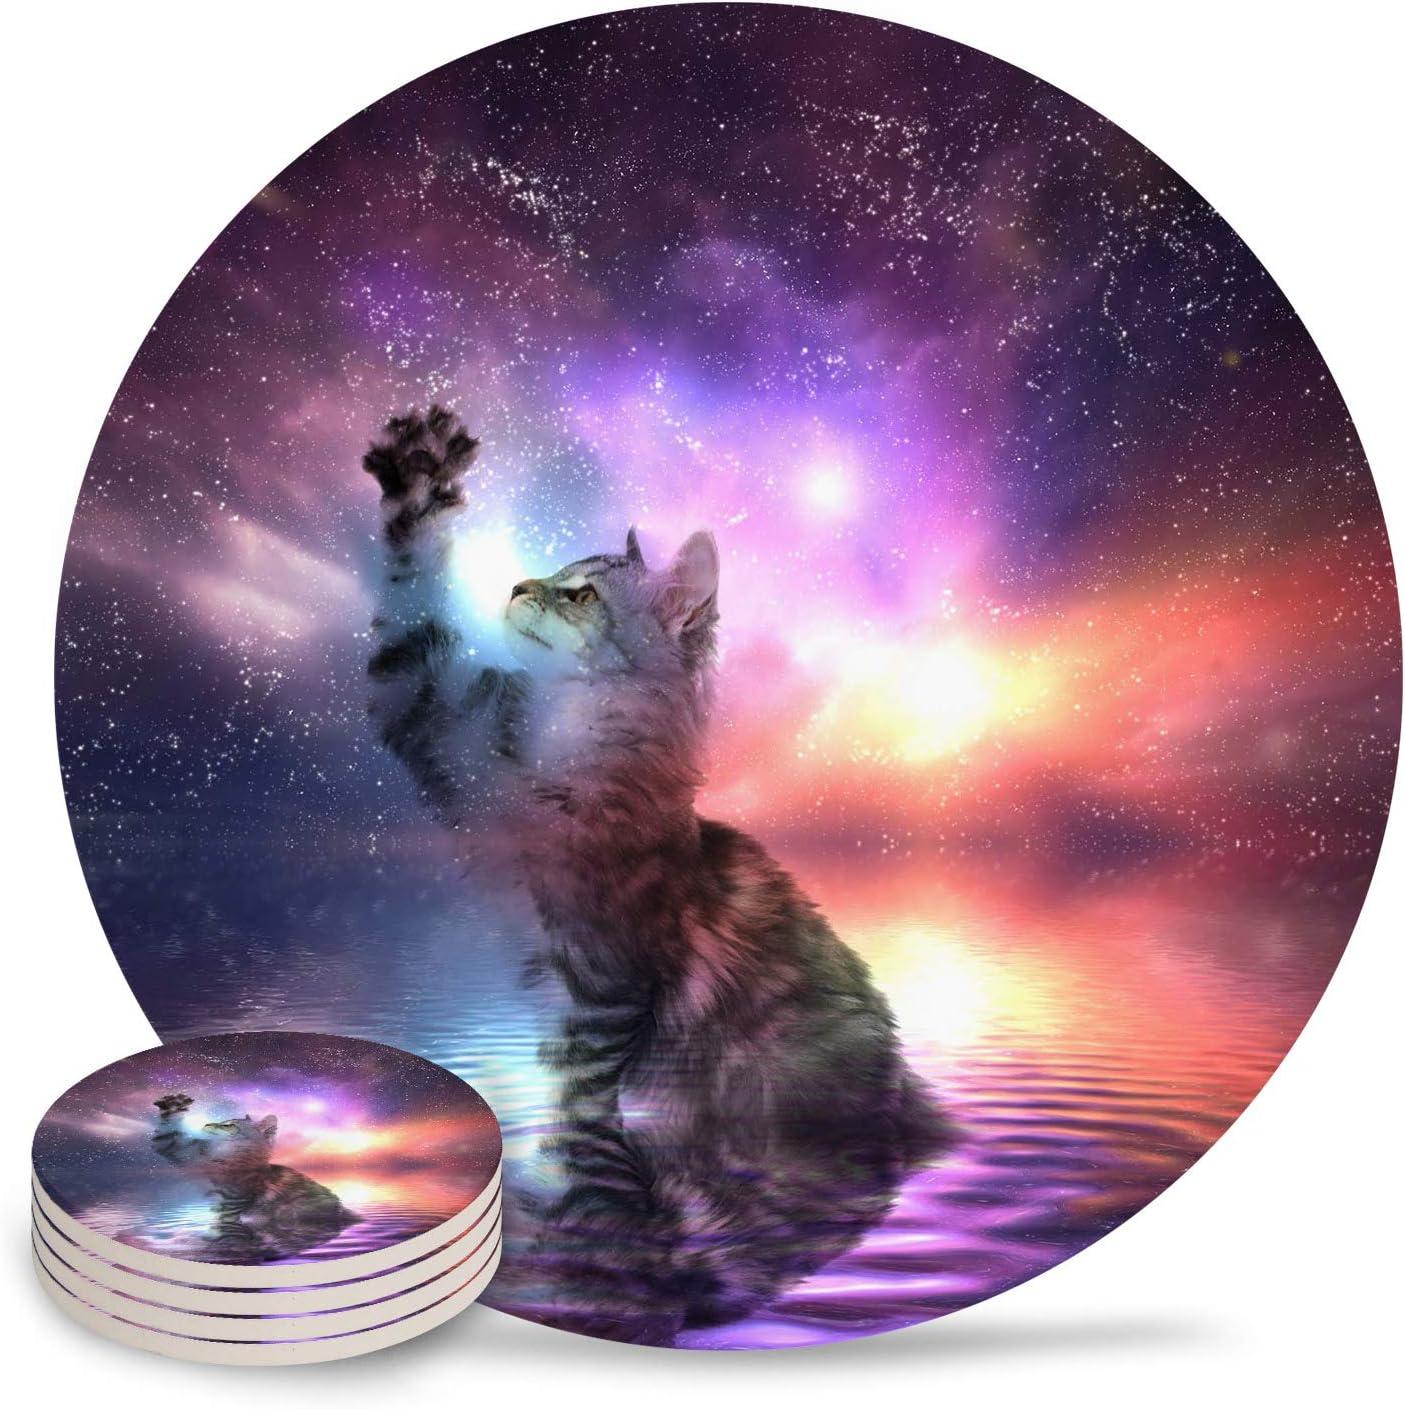 Drink Coasters Fantasy Inexpensive Pet Cat Absorbent Coaster Ceramic w Stone Las Vegas Mall